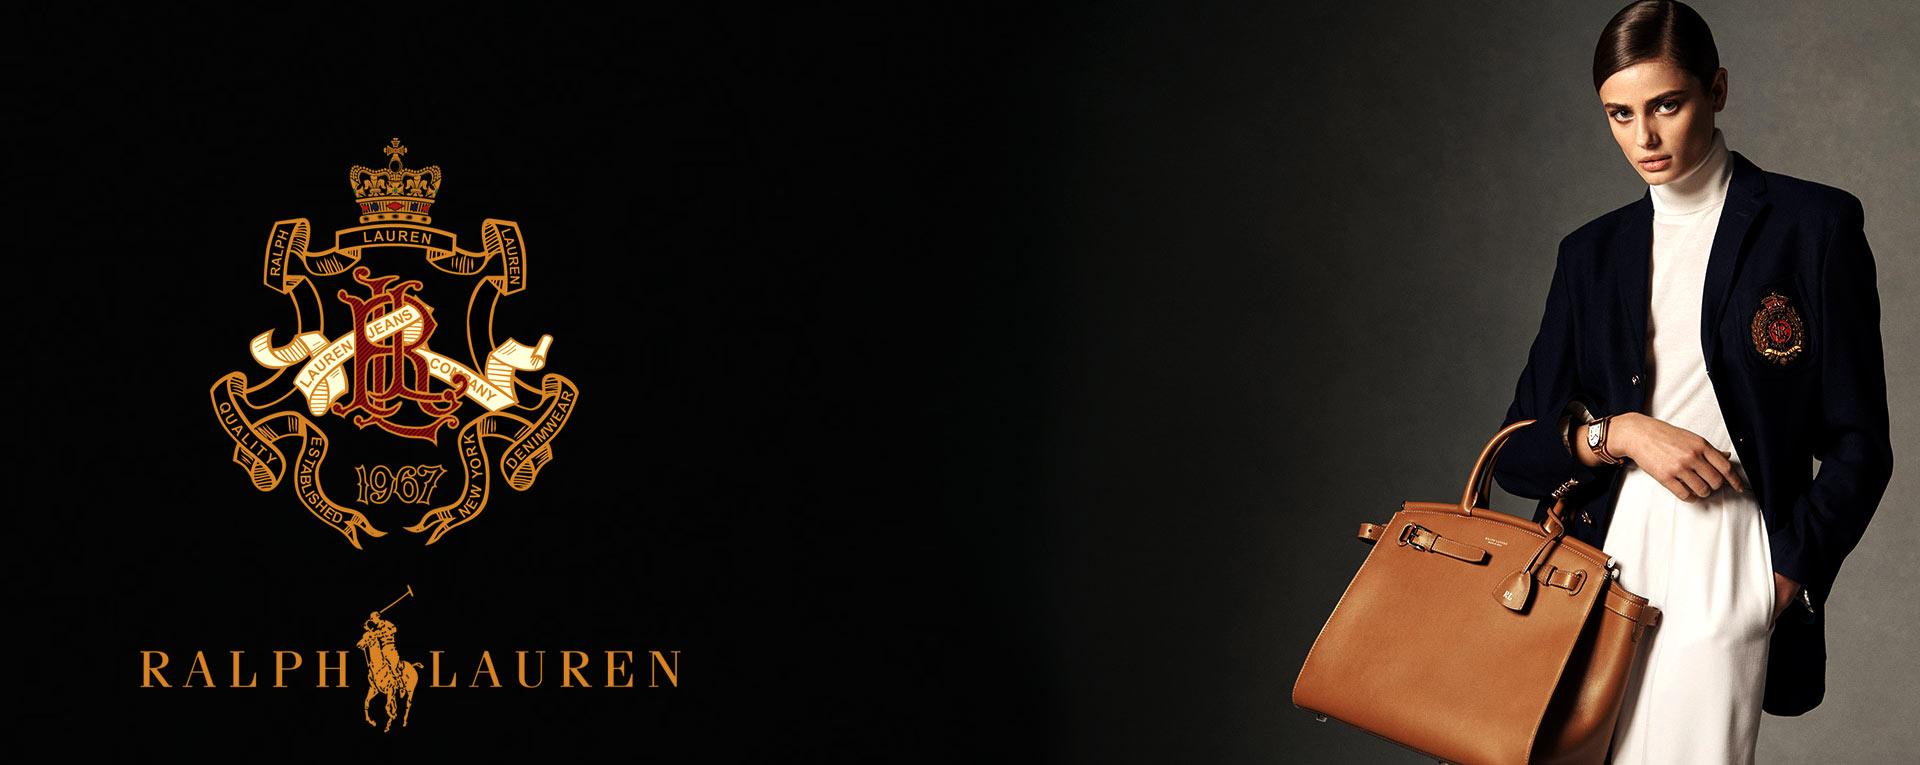 Ralph Lauren 2 1 - رالف لورن | Ralph Lauren